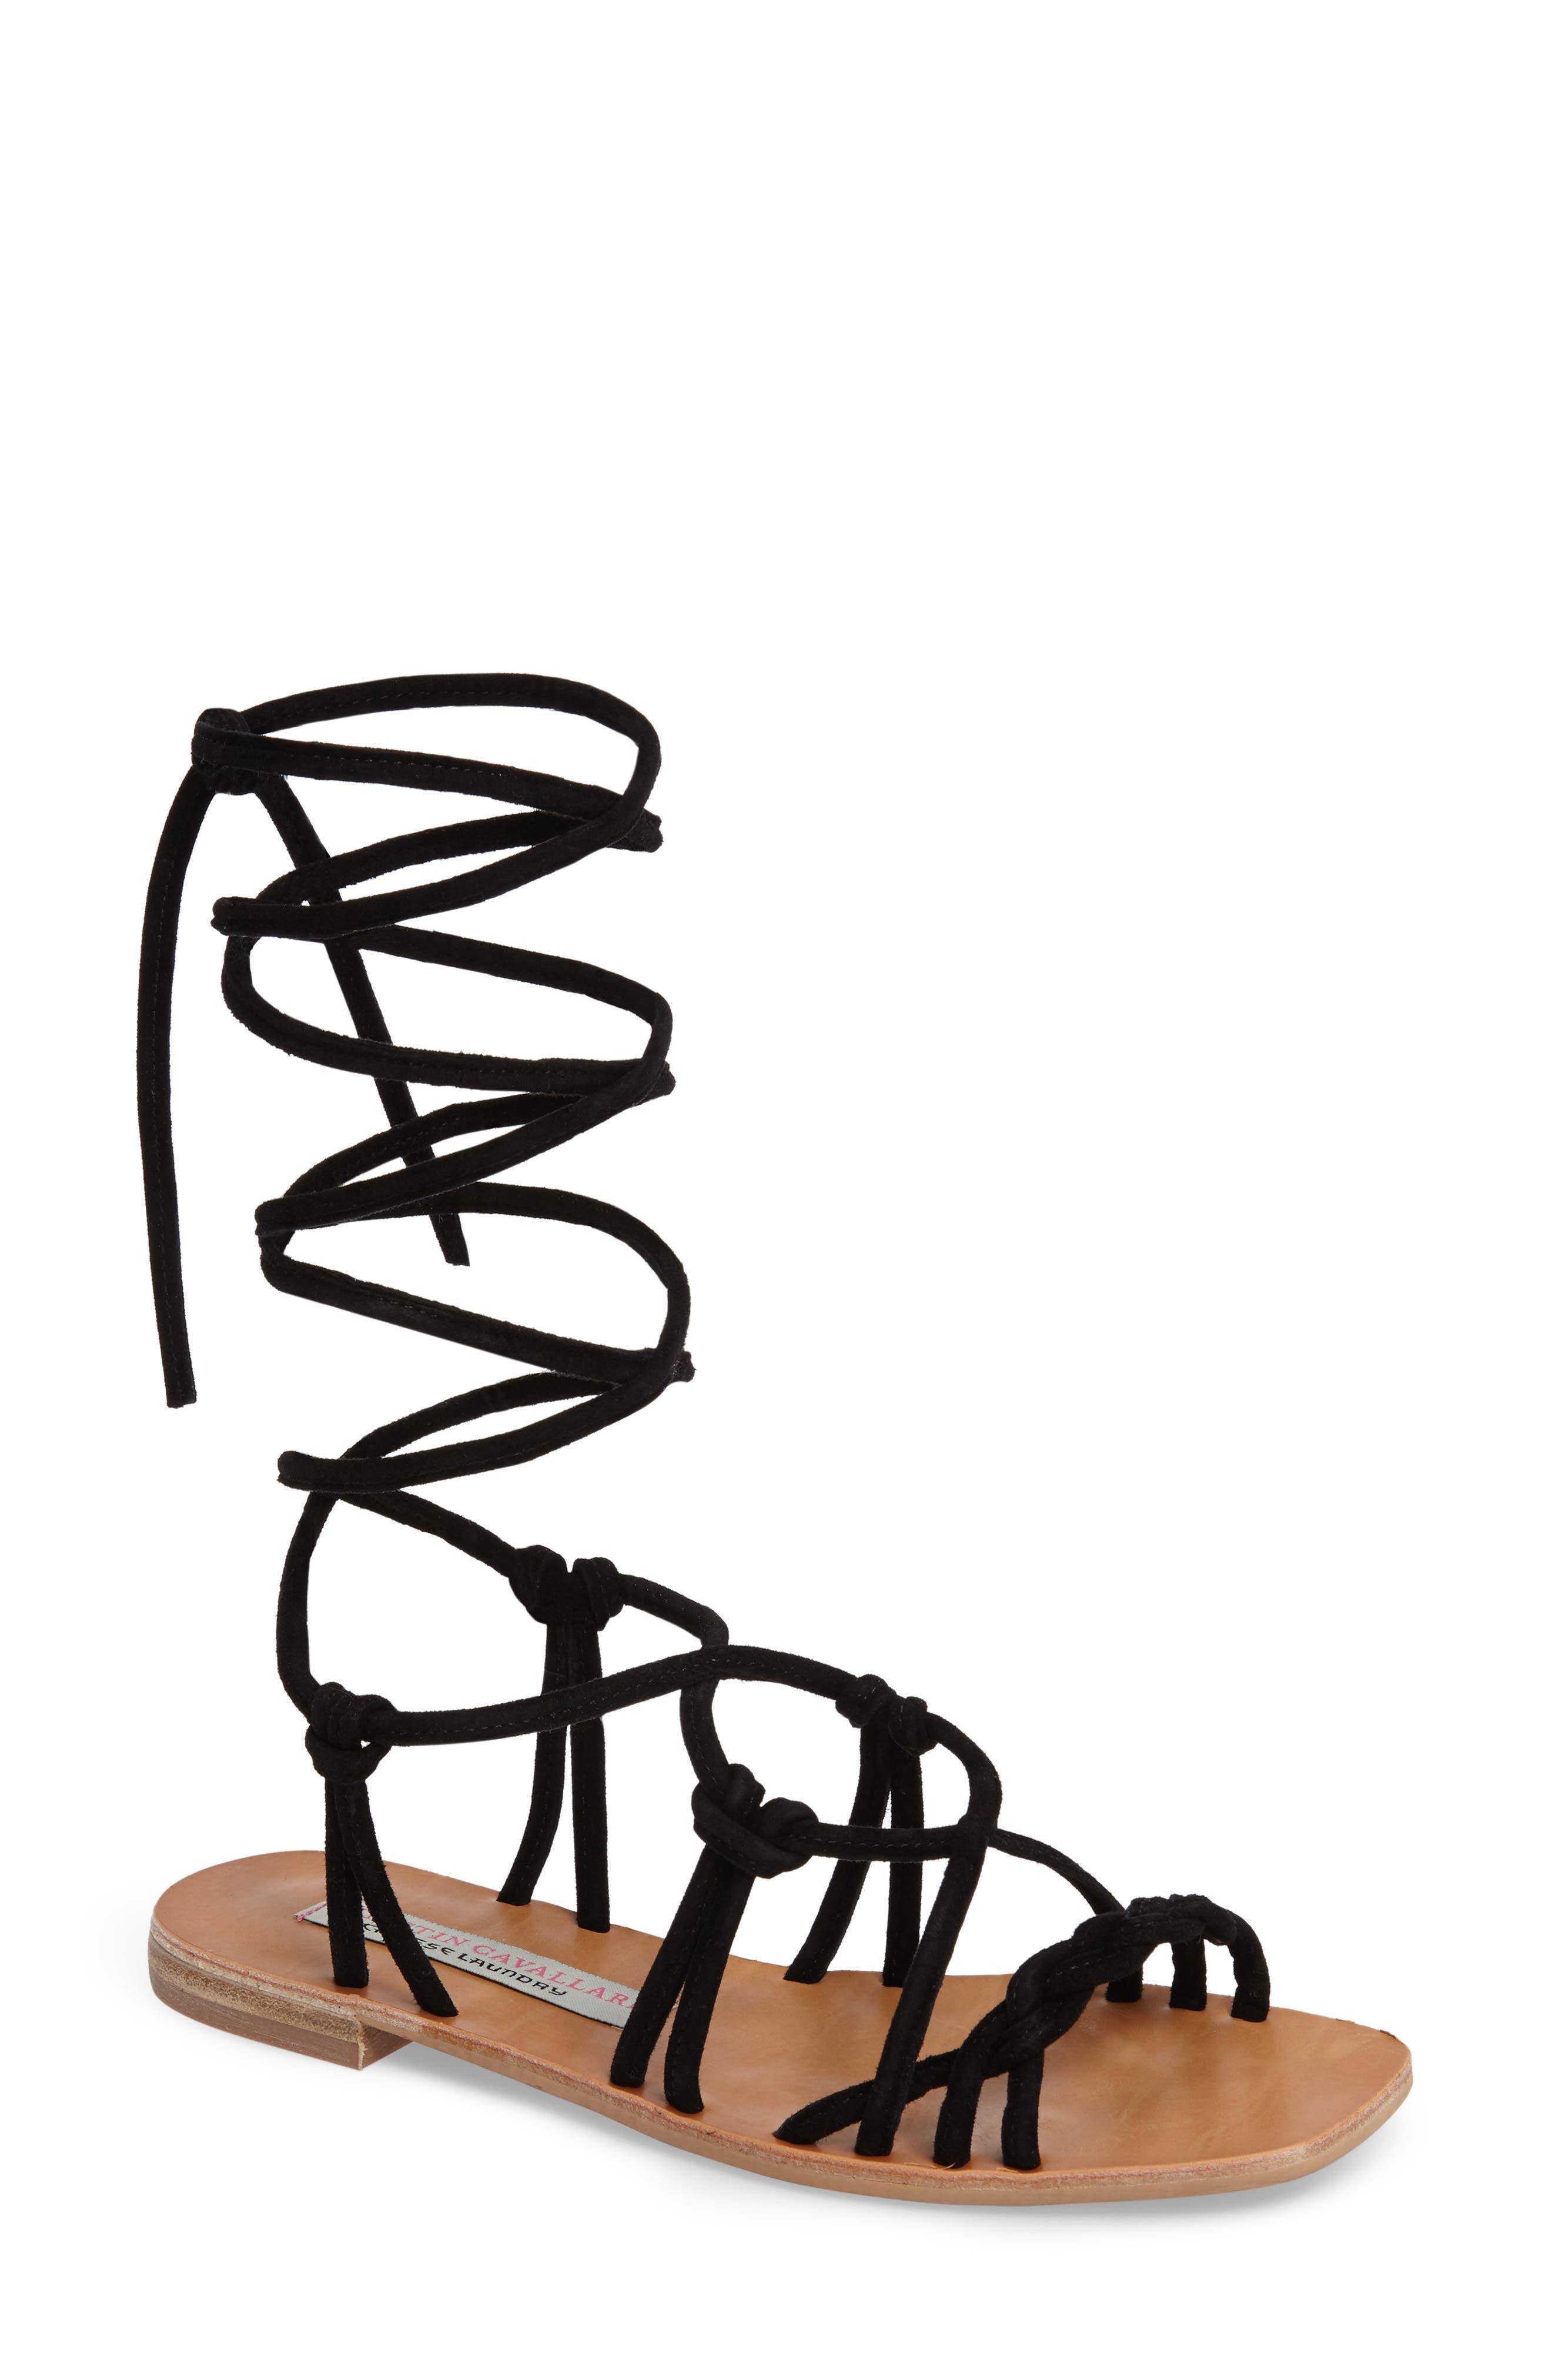 KRISTIN CAVALLARI Tori Knotted Wraparound Sandal, Main, color, 001